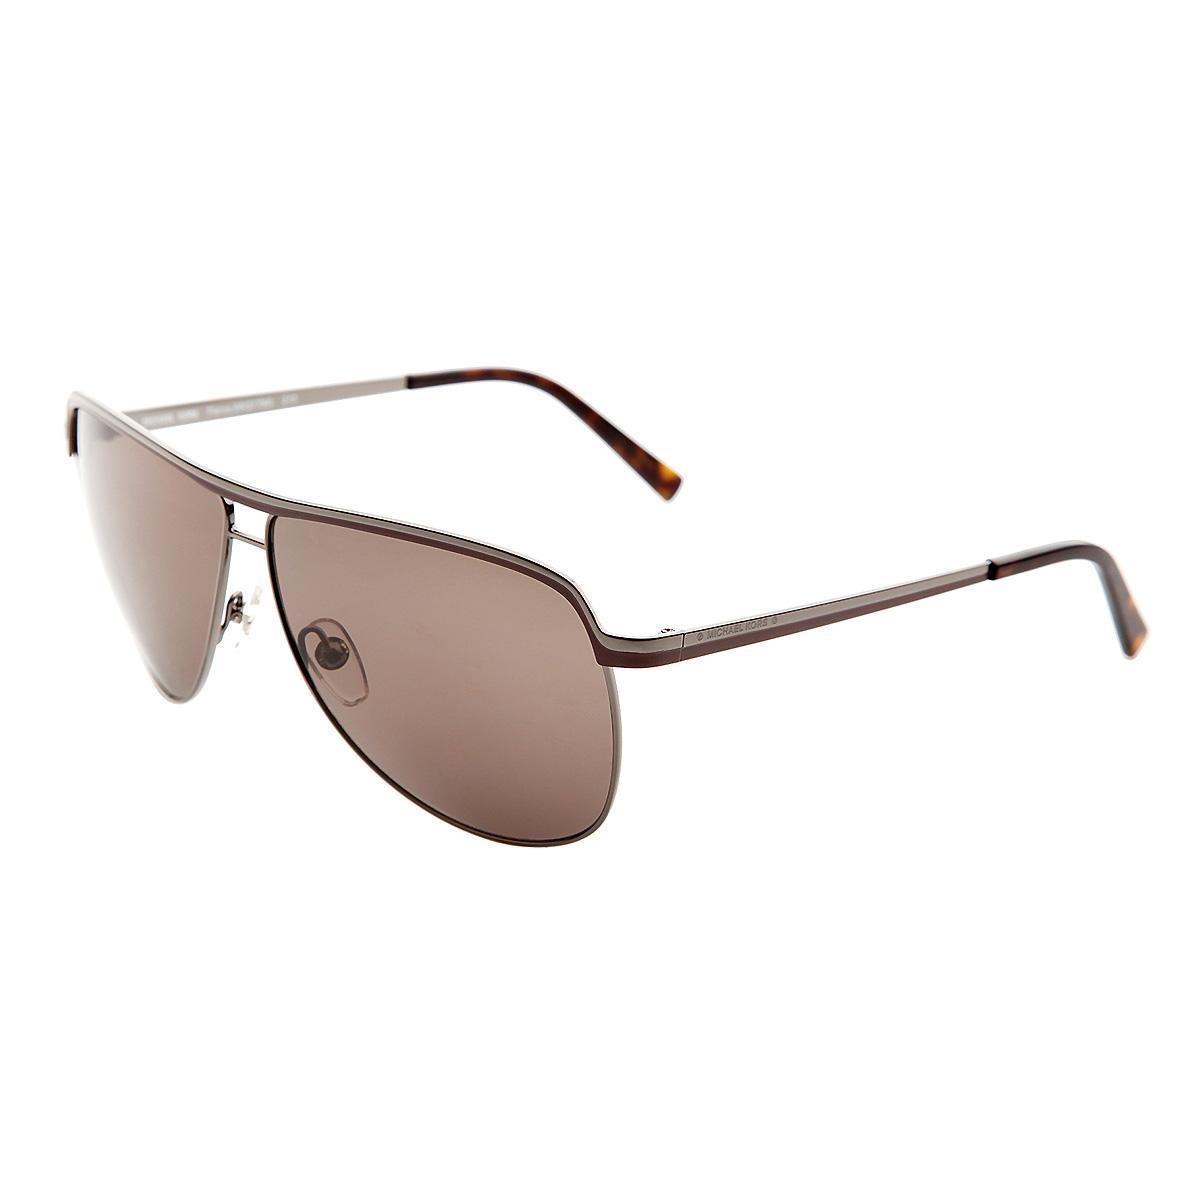 michael kors sonnenbrille m2469srx 239 herren men sunglasses braun neu ovp. Black Bedroom Furniture Sets. Home Design Ideas